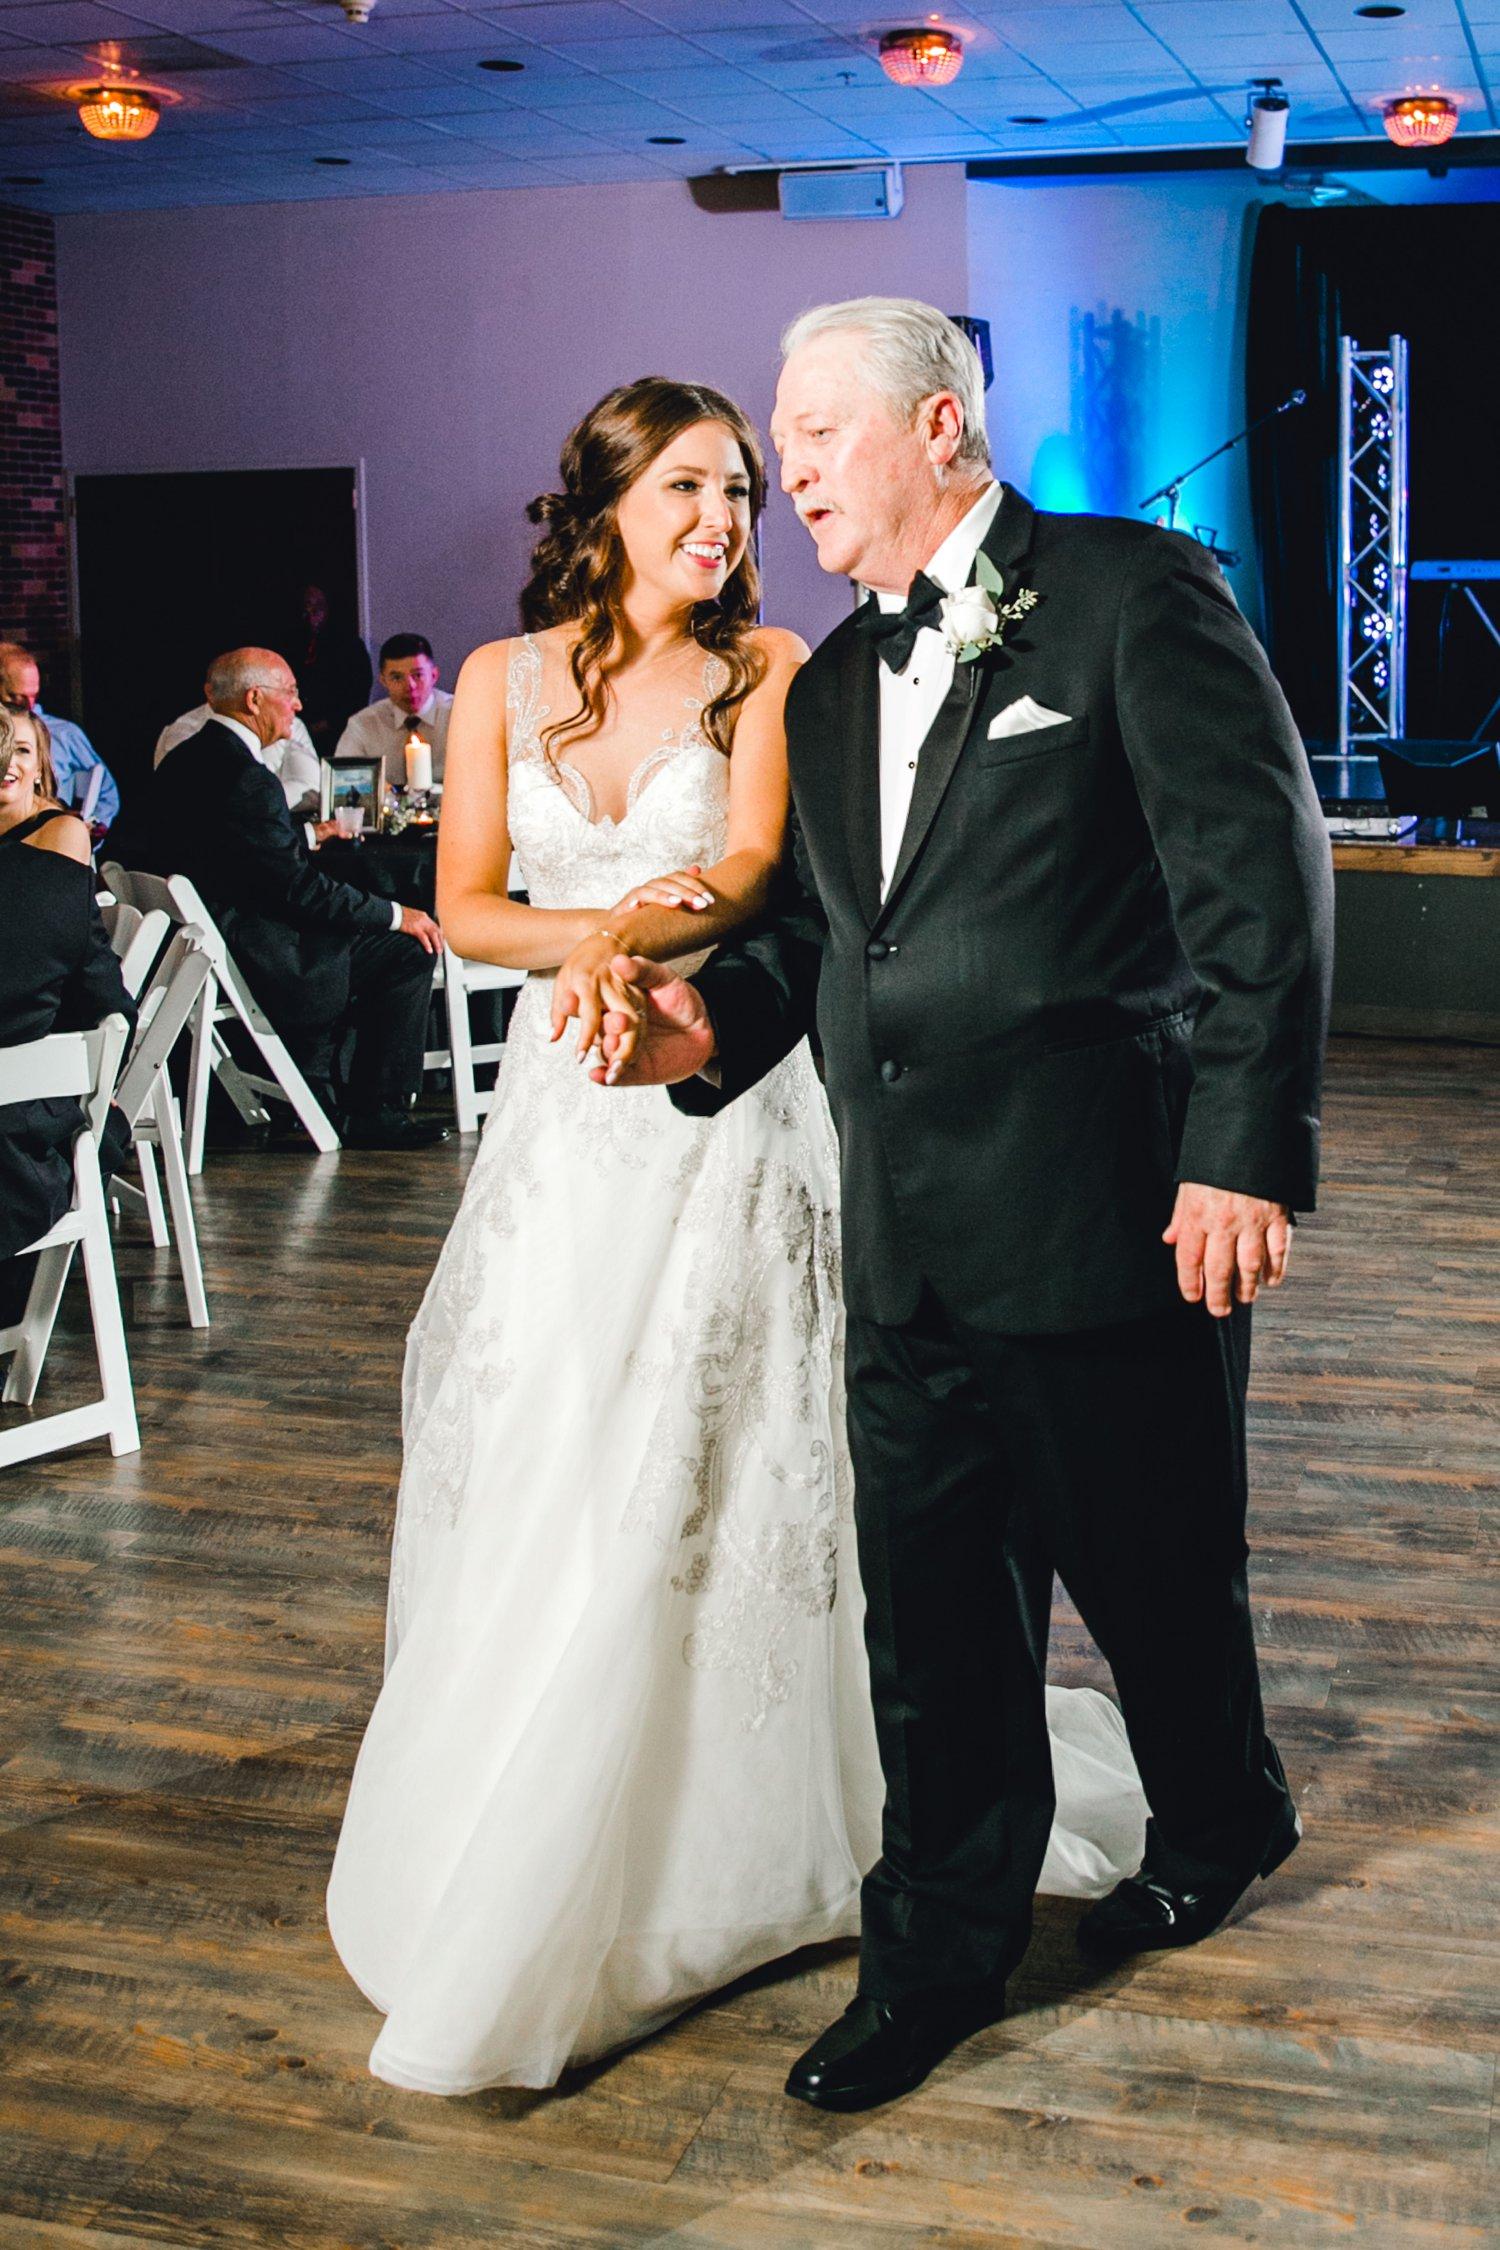 Hunter_and_Molly_Rawls_ALLEEJ_Lubbock_WEDDING_Legacy_Event_Center_0168.jpg